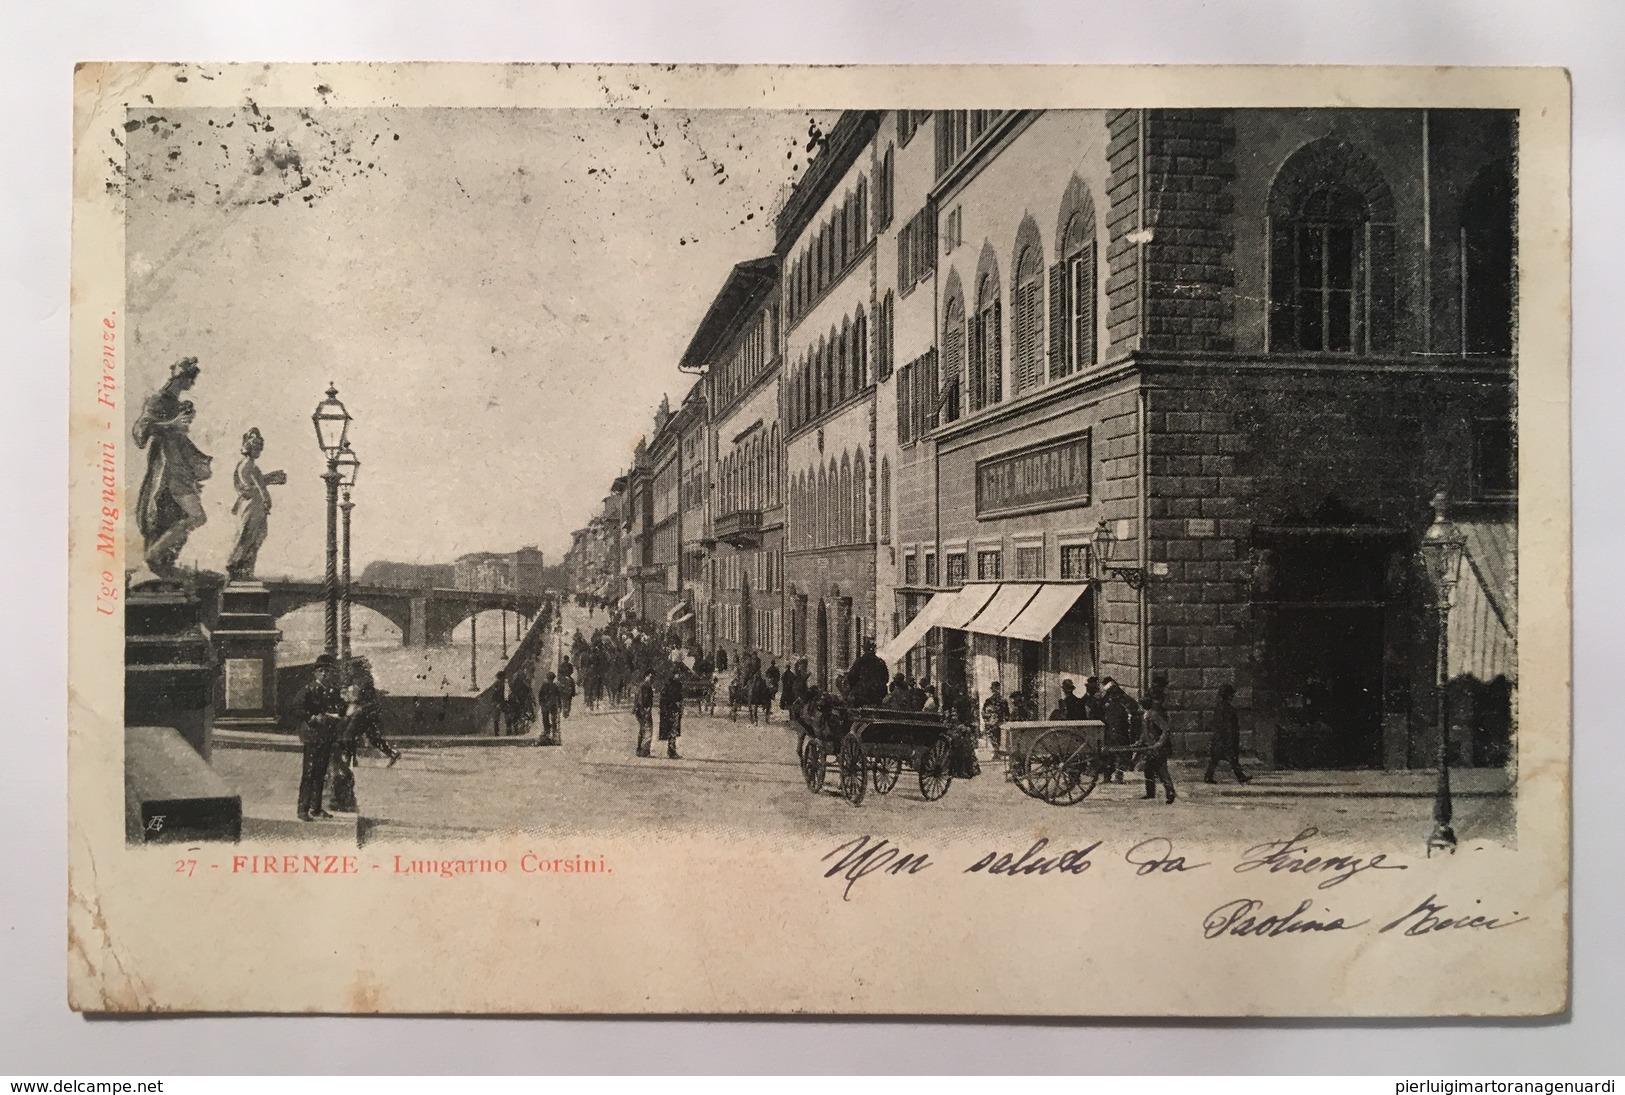 V 11048 Firenze - Lungarno Corsini - Firenze